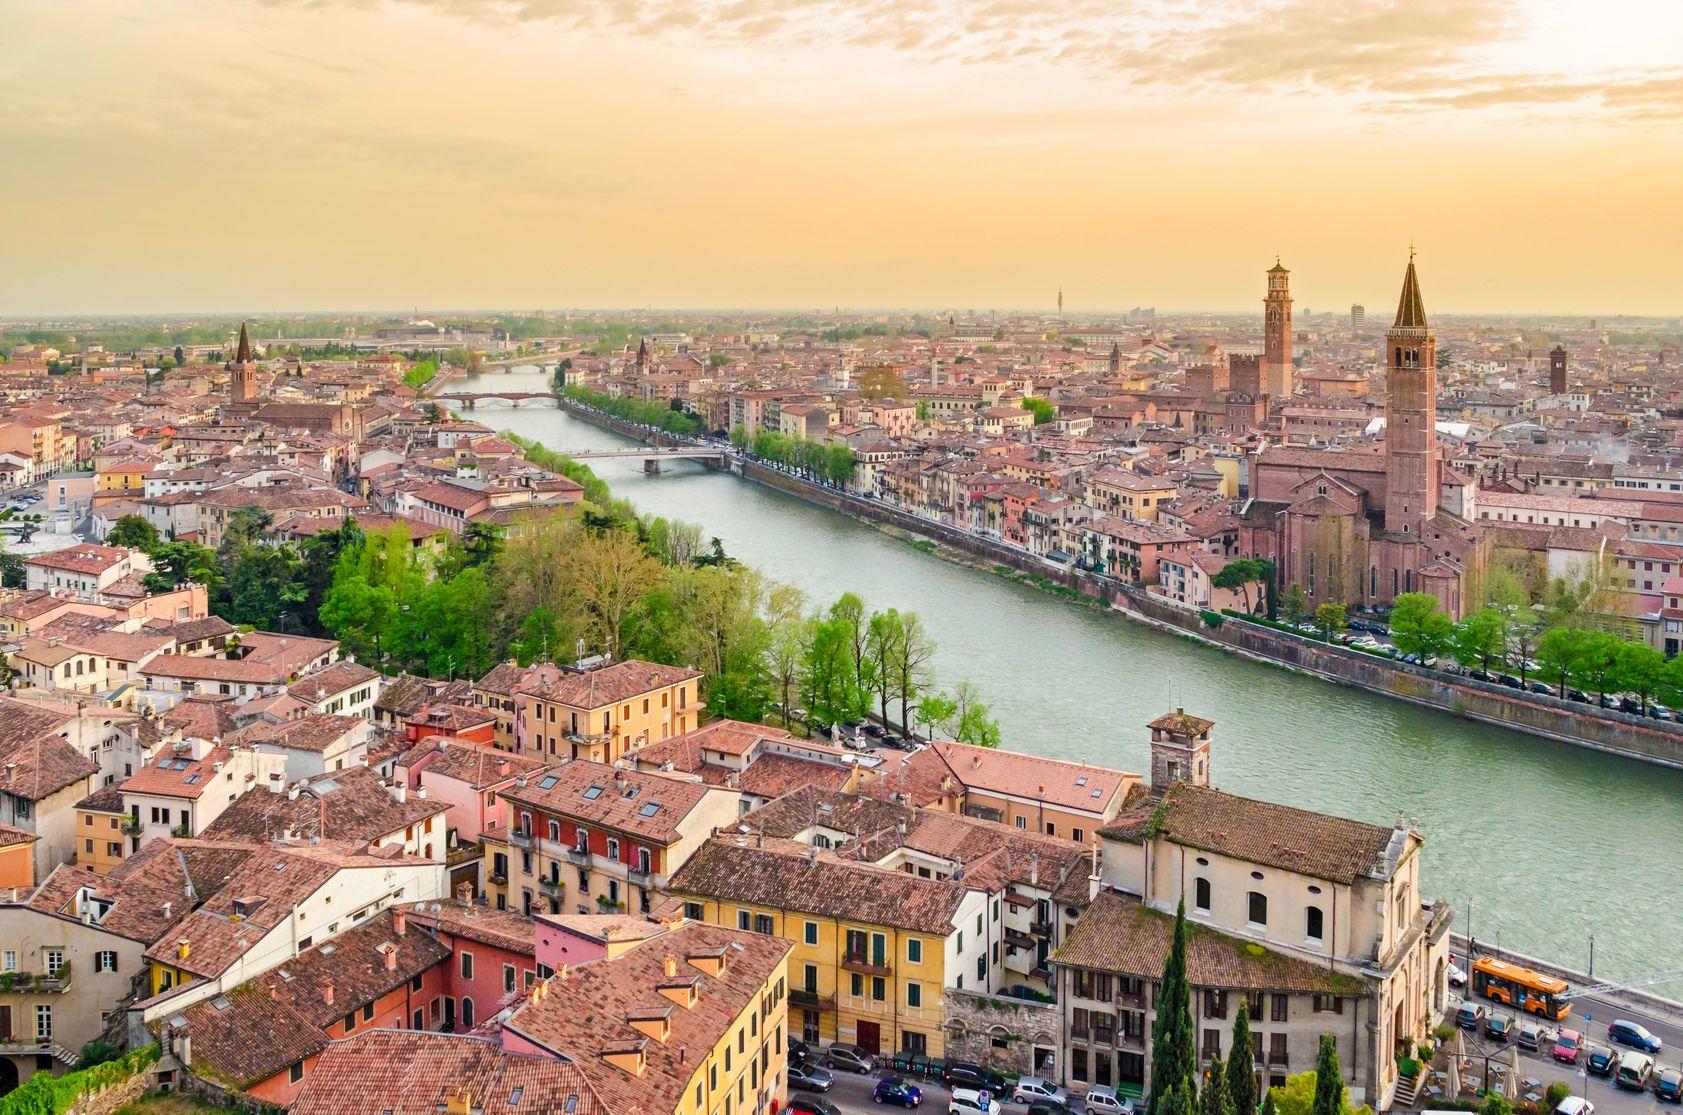 Zajimava Mista A Pamatky V Italskem Meste Verona Travelmag Cz